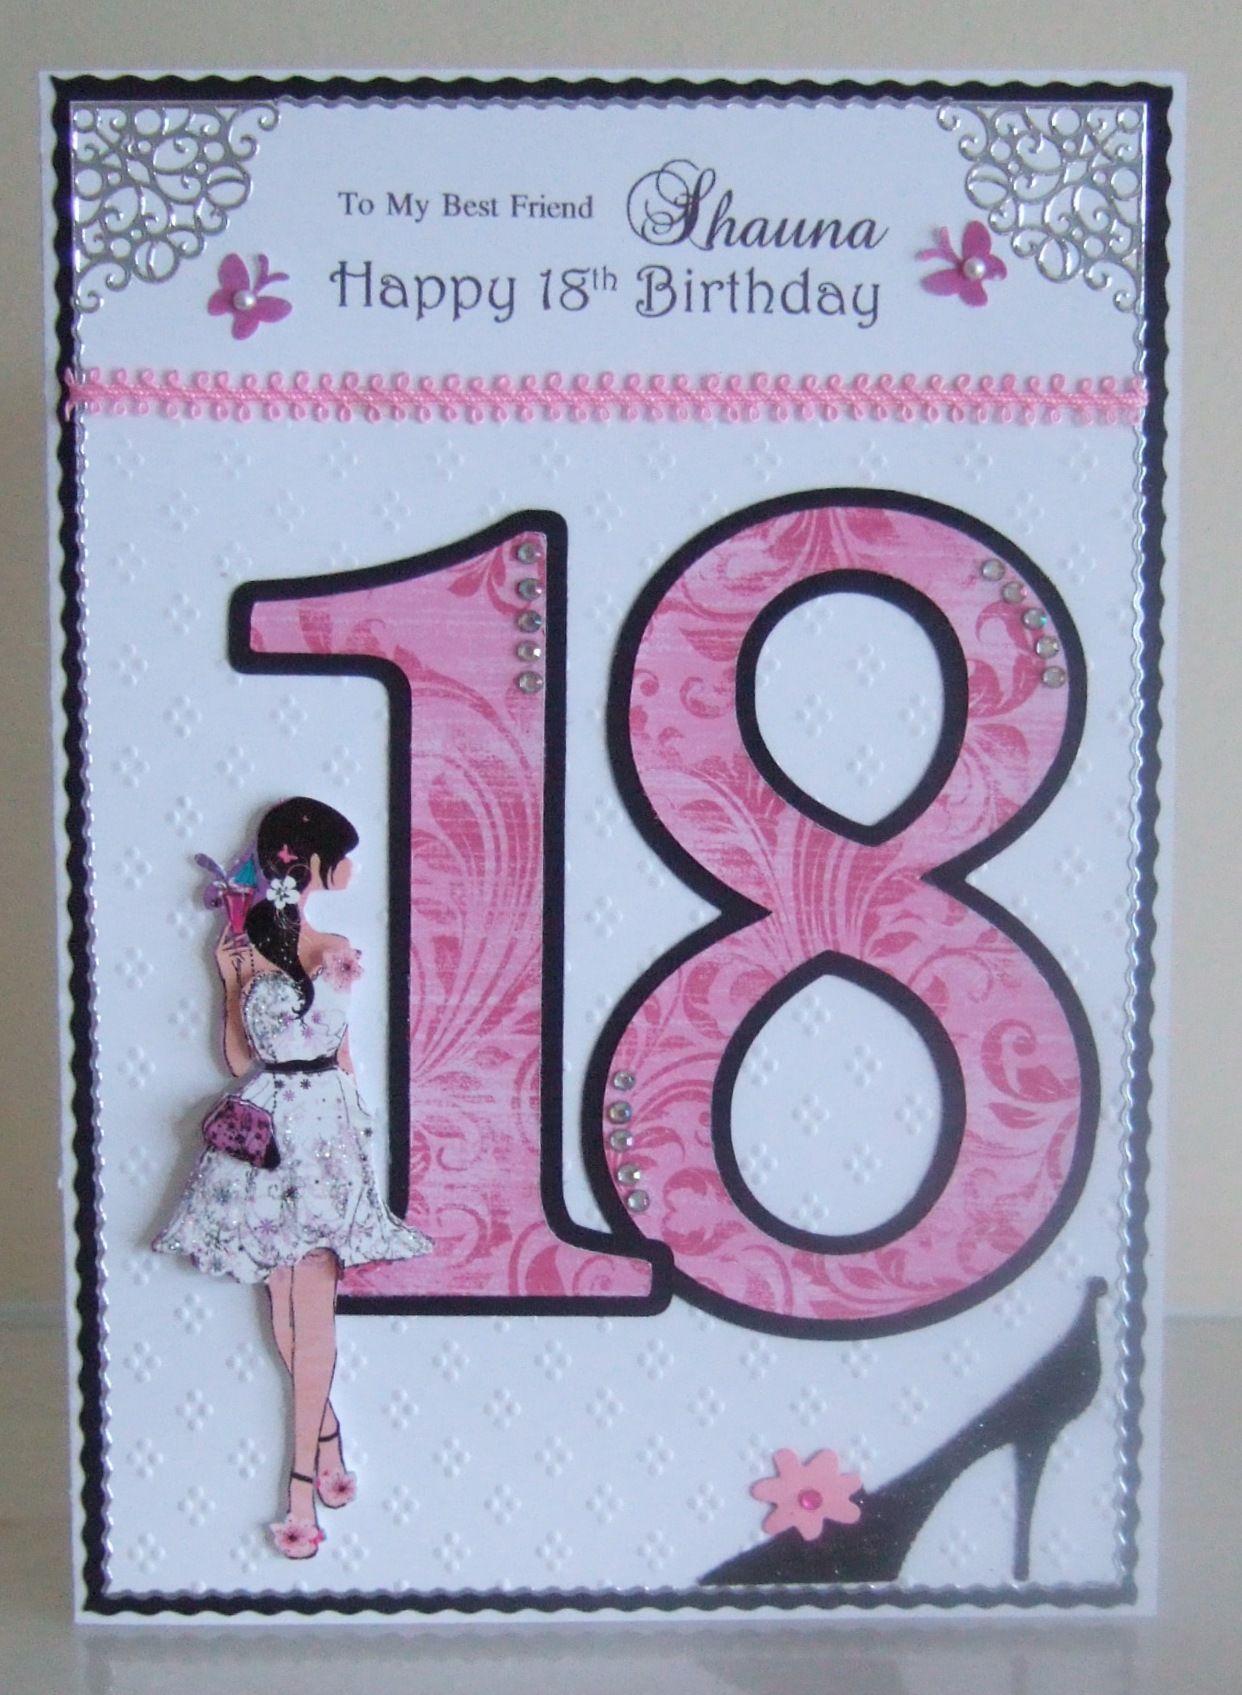 18th Birthday Card 18th Birthday Cards Girl Birthday Cards Creative Cards